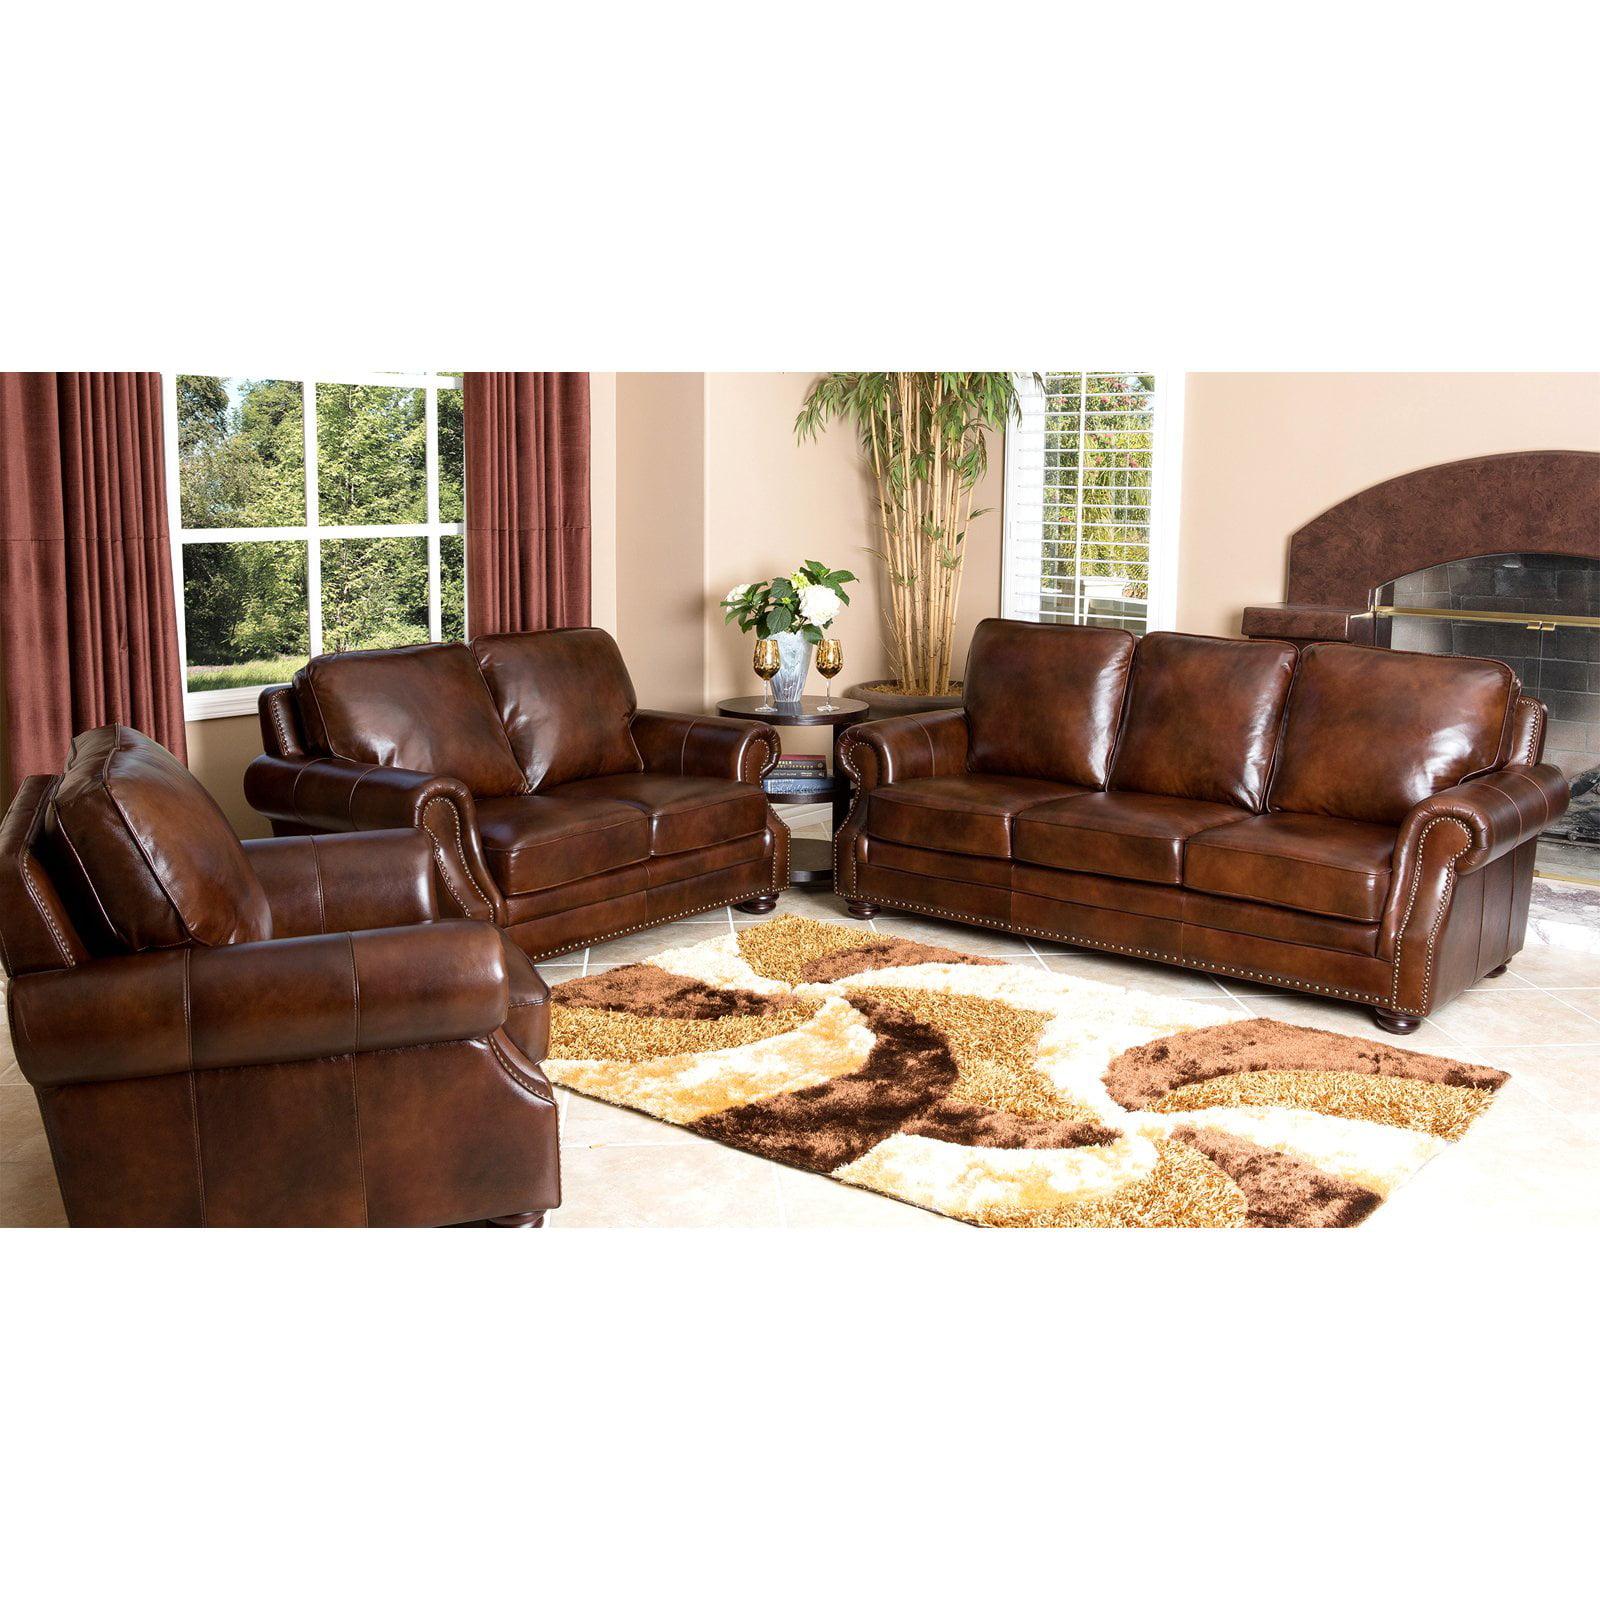 Abbyson Karington 3 Piece Hand Rubbed Leather Sofa Set - Brown